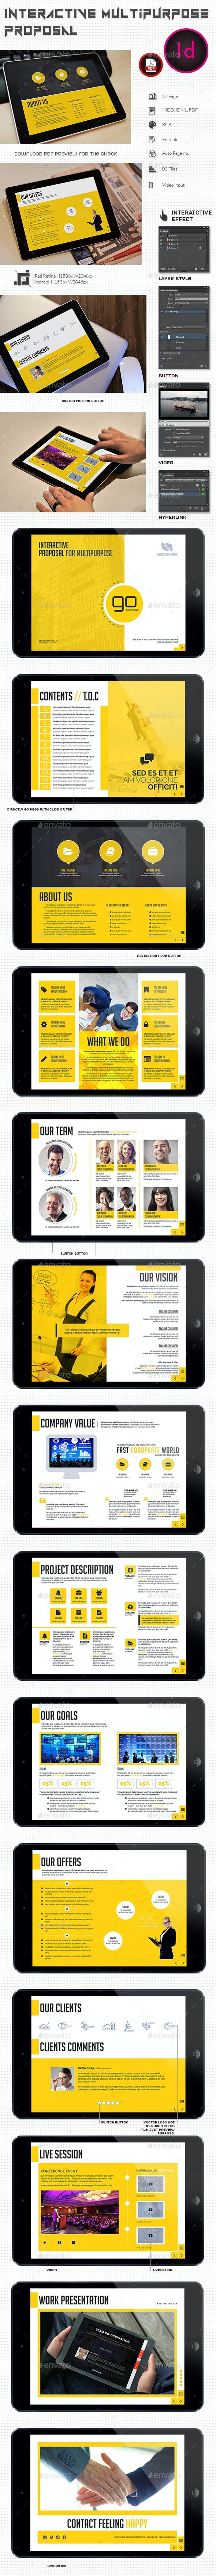 Interactive Multipurpose Proposal - Digital Books ePublishing